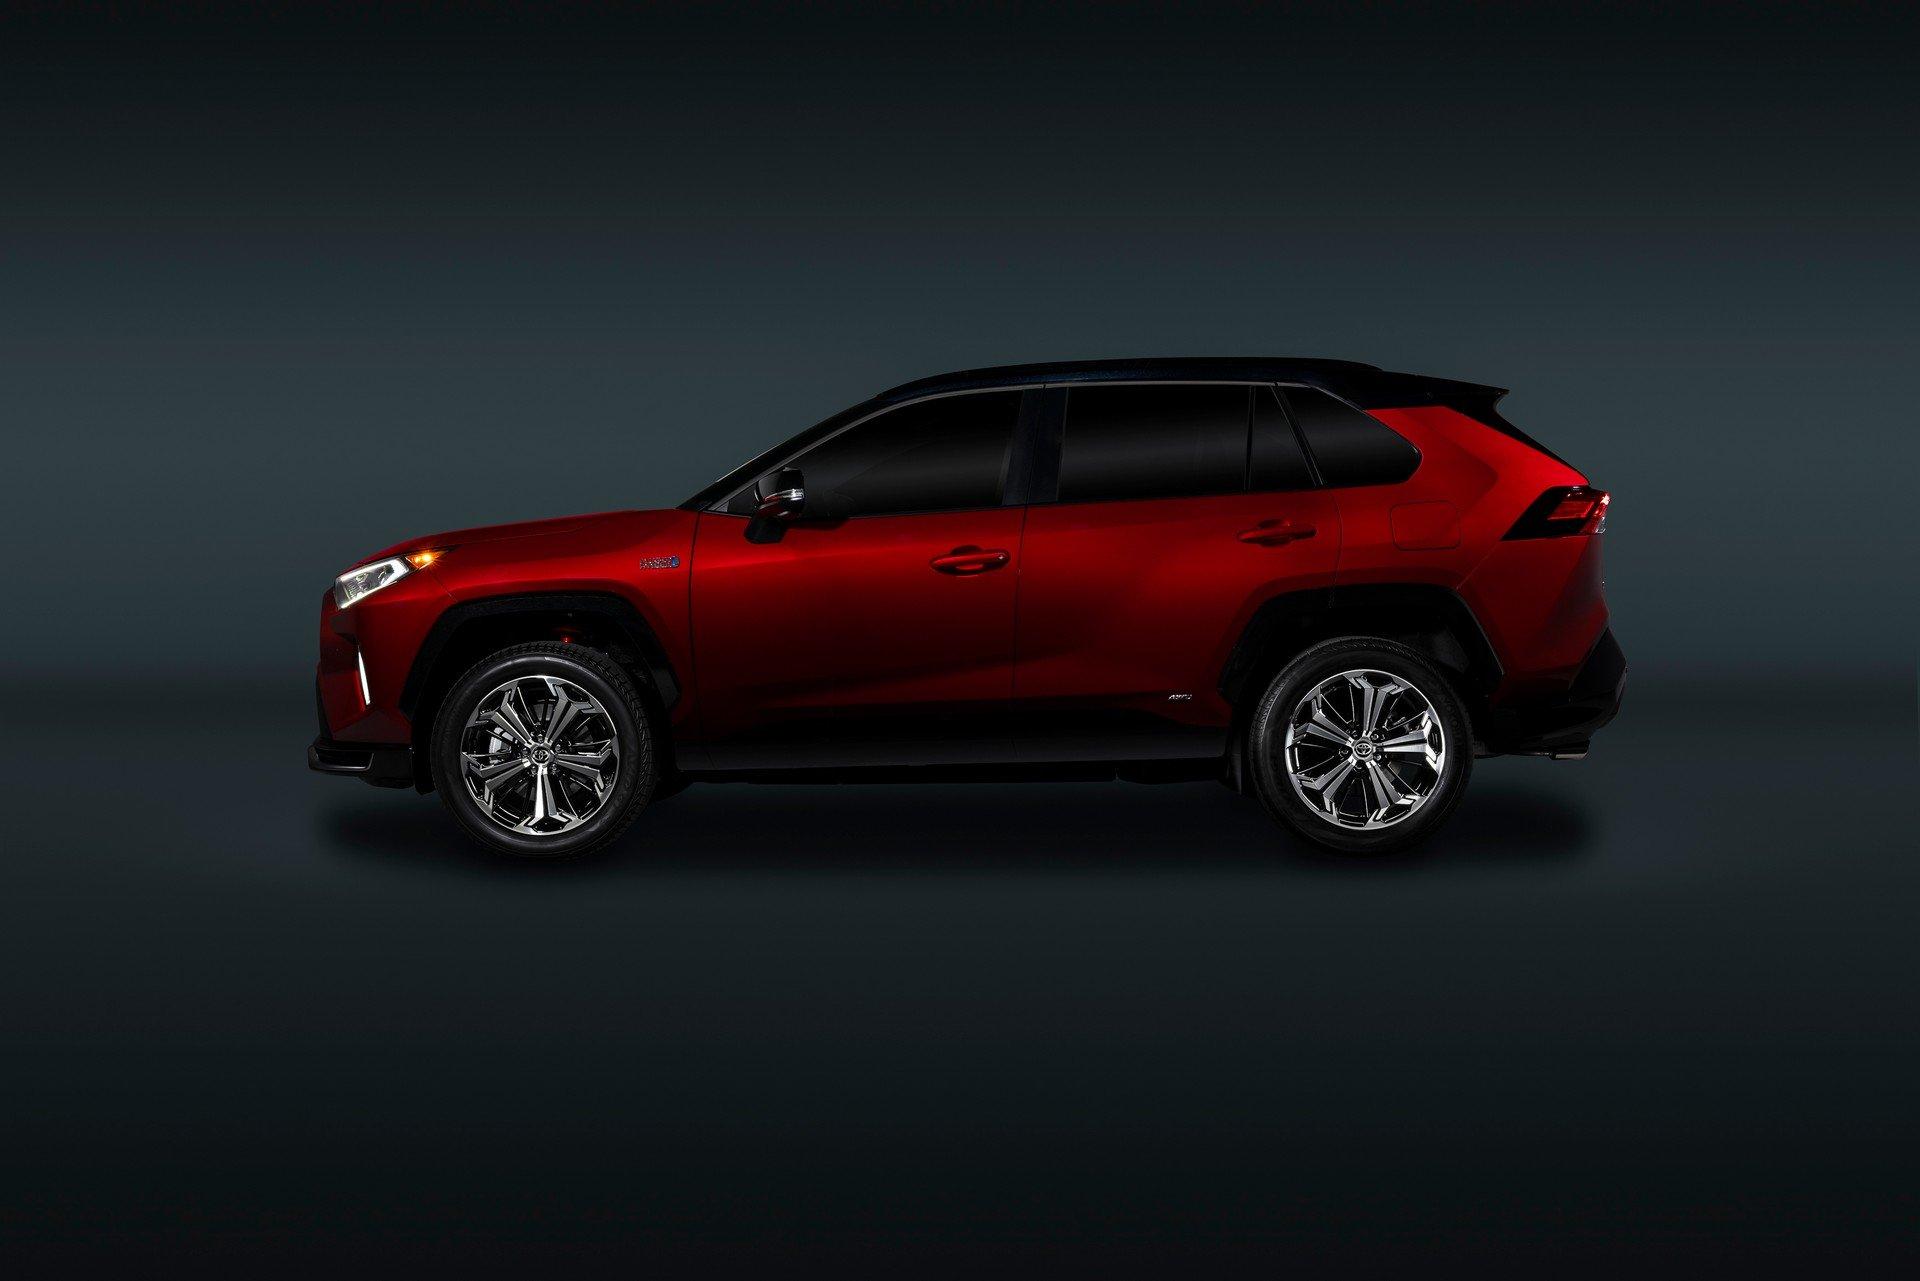 Toyota-RAV4-Plug-in-Hybrid-Prime-2020-13